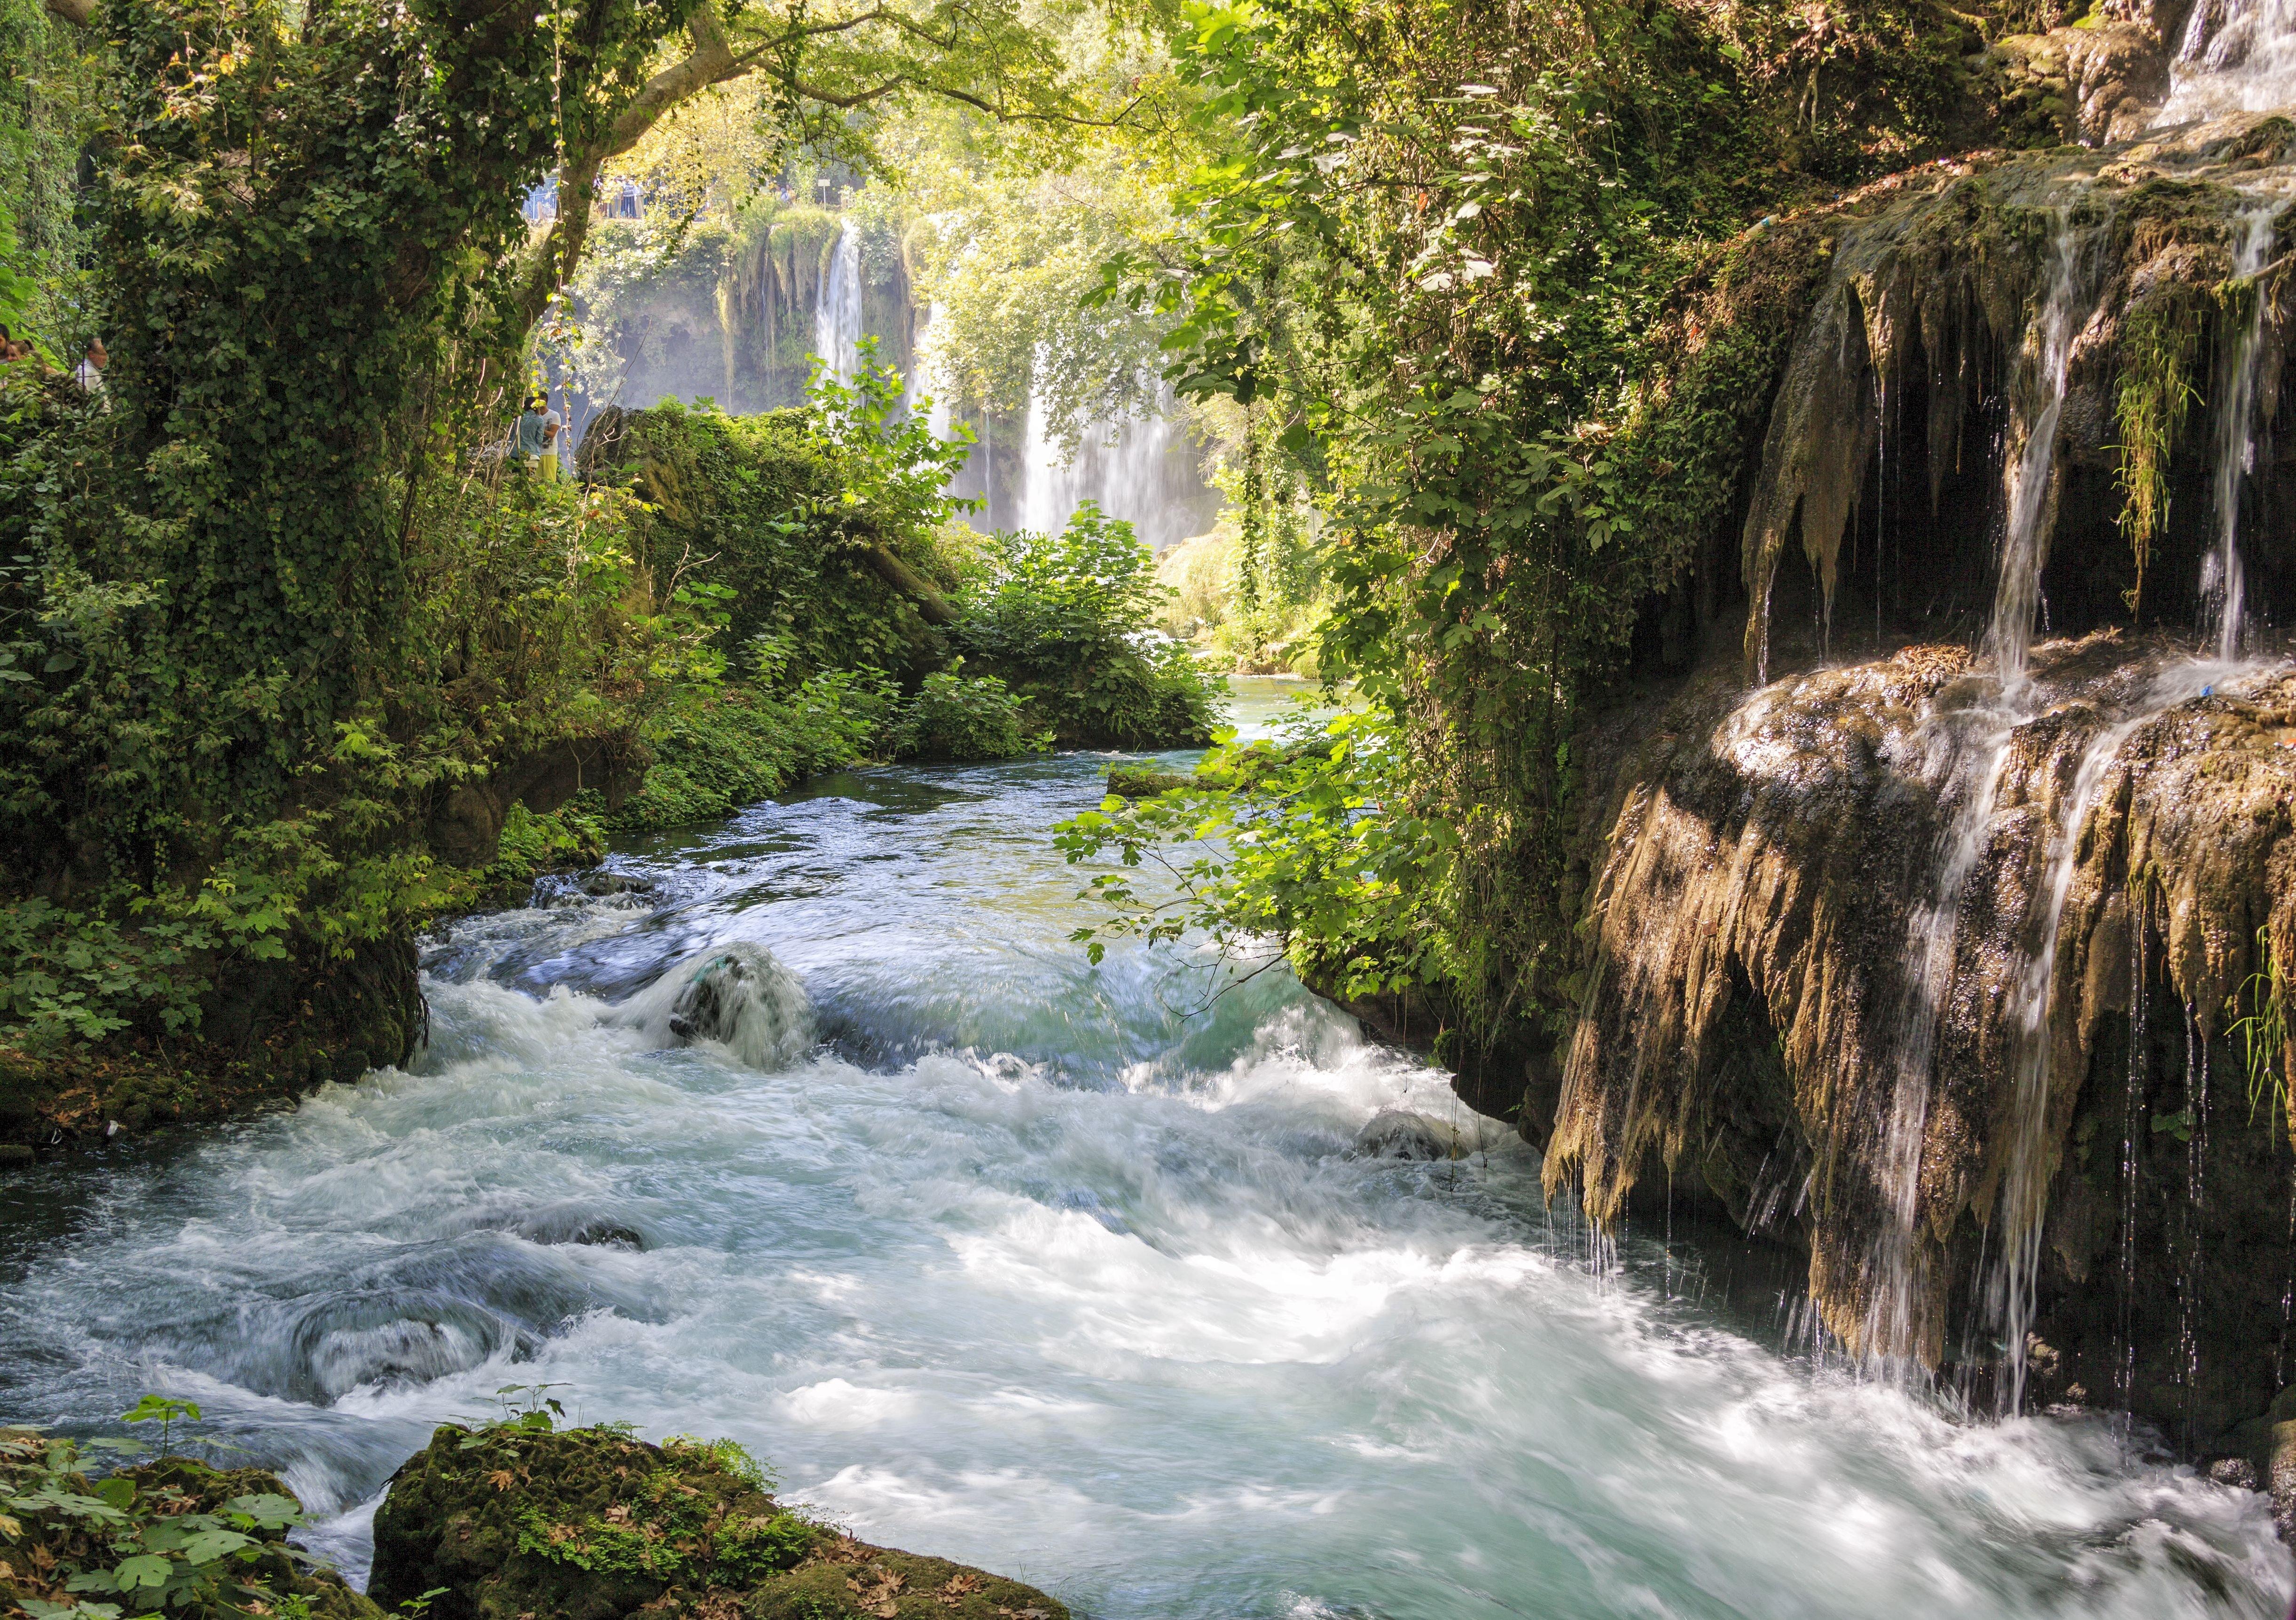 waterfalls hd wallpaper download